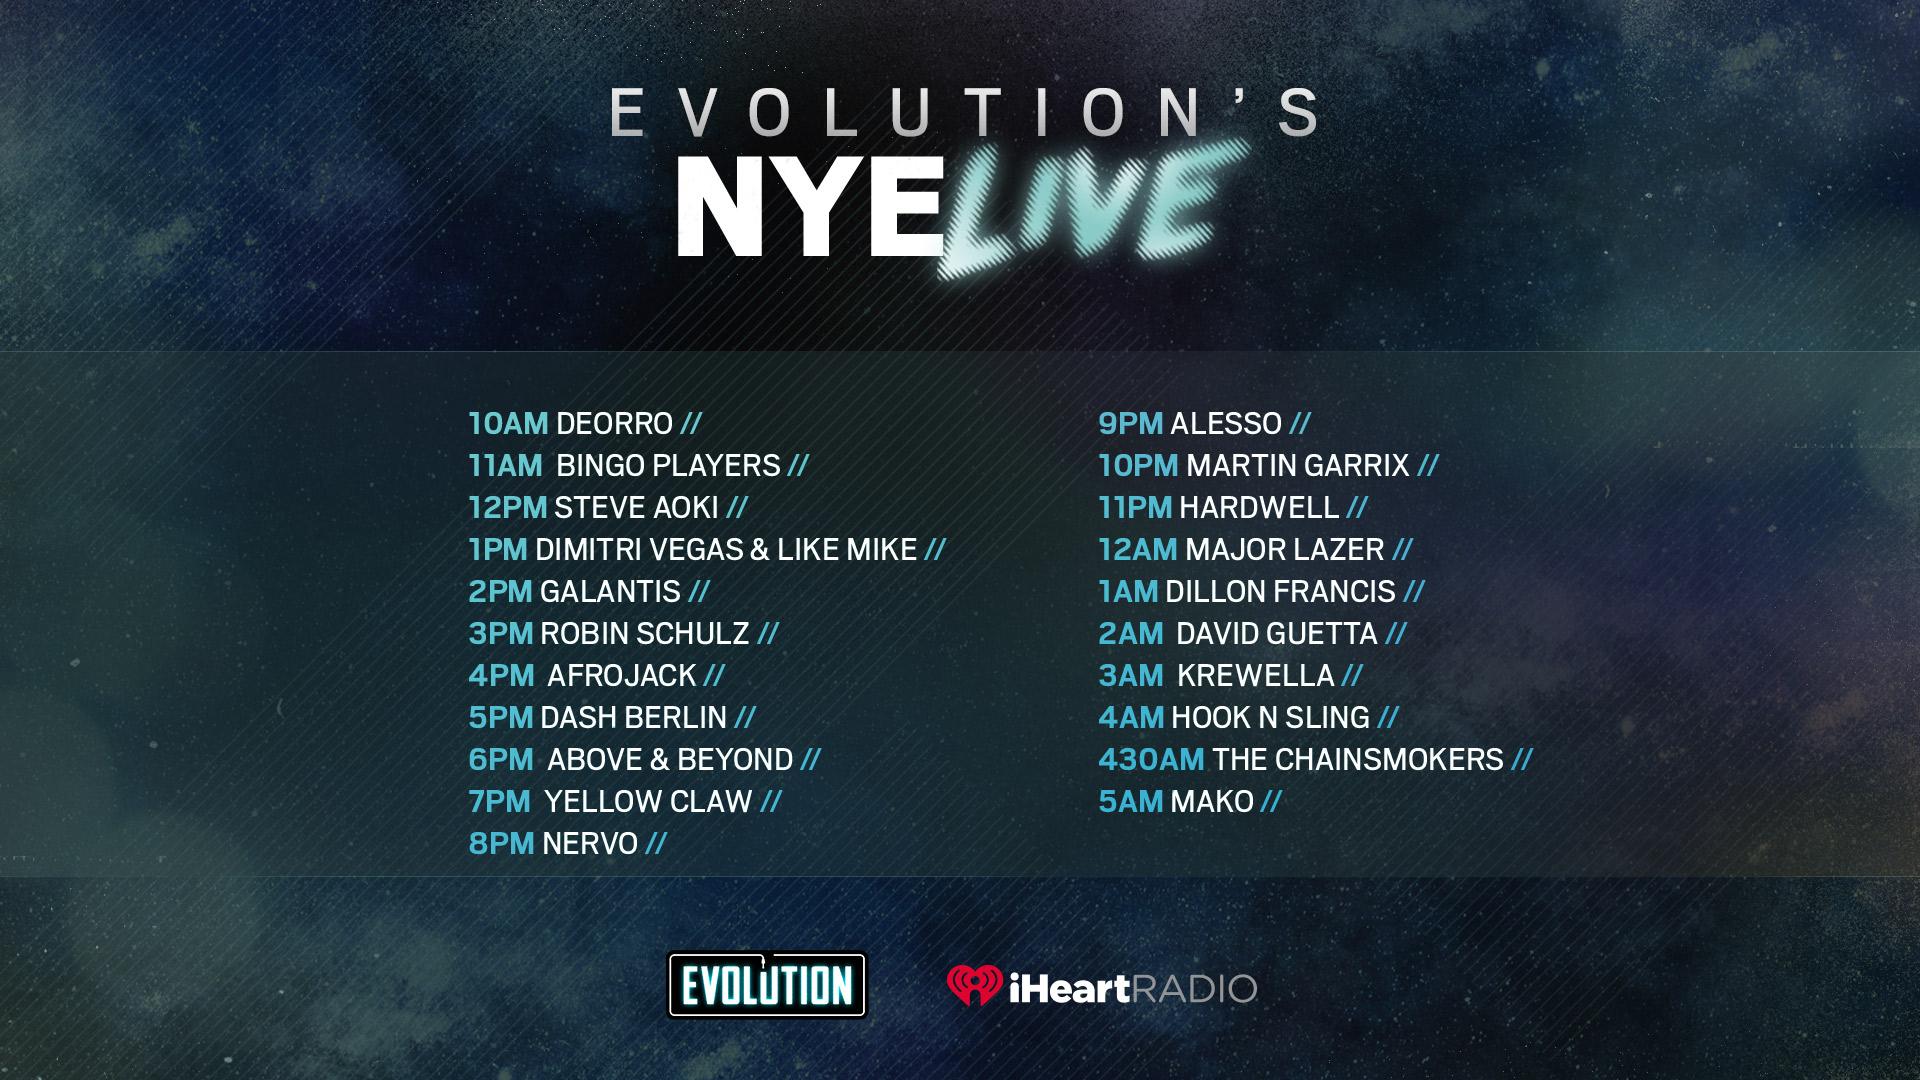 iheartradio_evolutions-nye-live